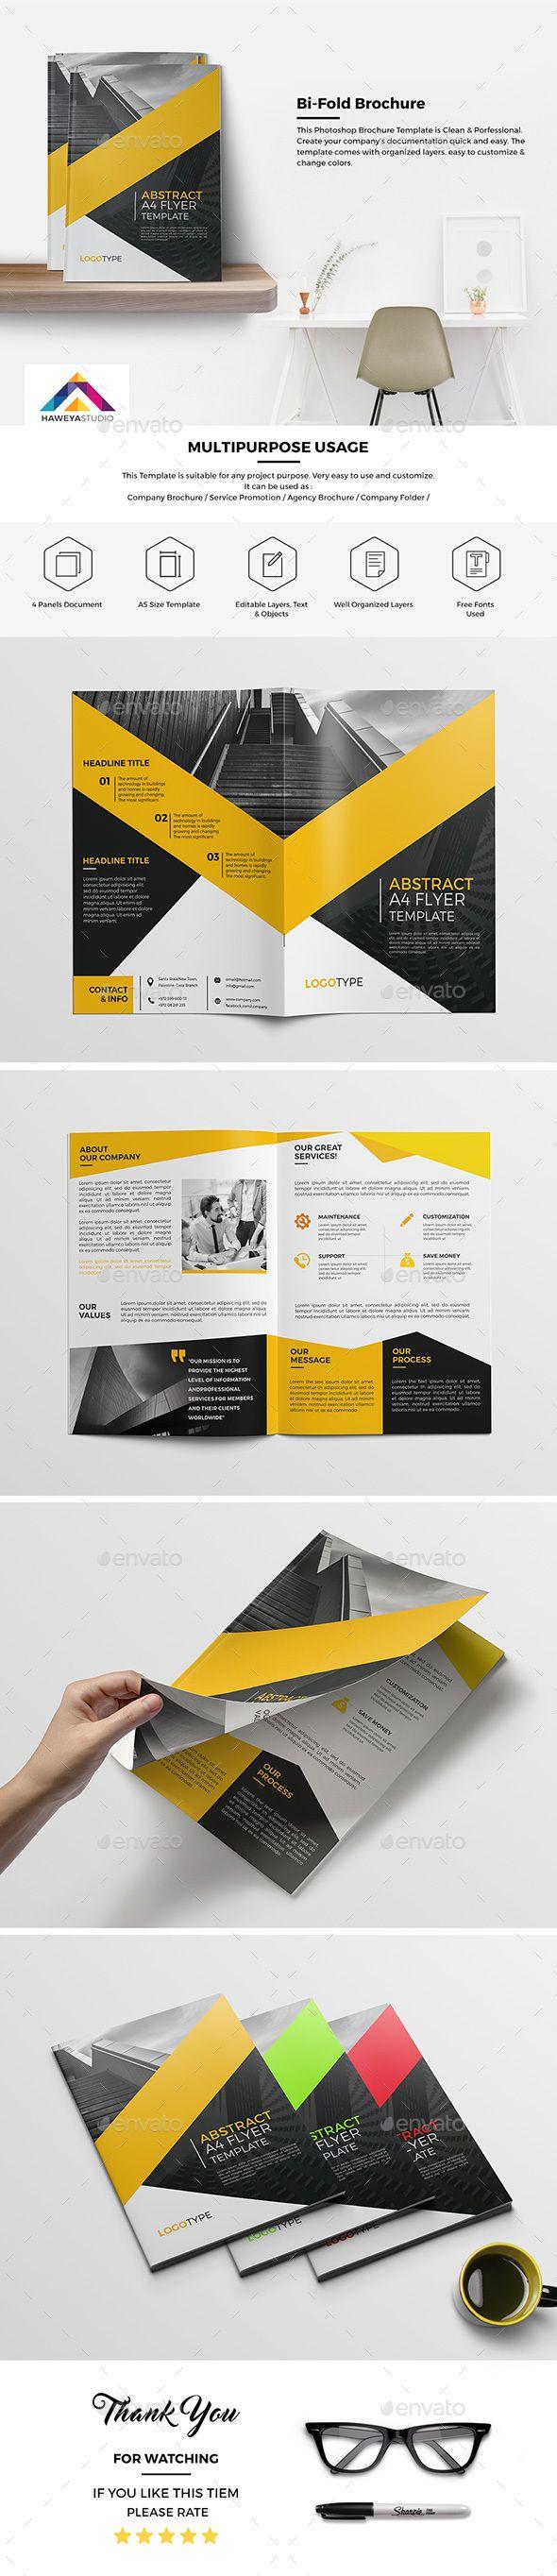 Haweya Bi-Fold Brochure Template PSD. Download here: http://graphicriver.net/item/haweya-bifold-brochure-04-/15649117?ref=ksioks